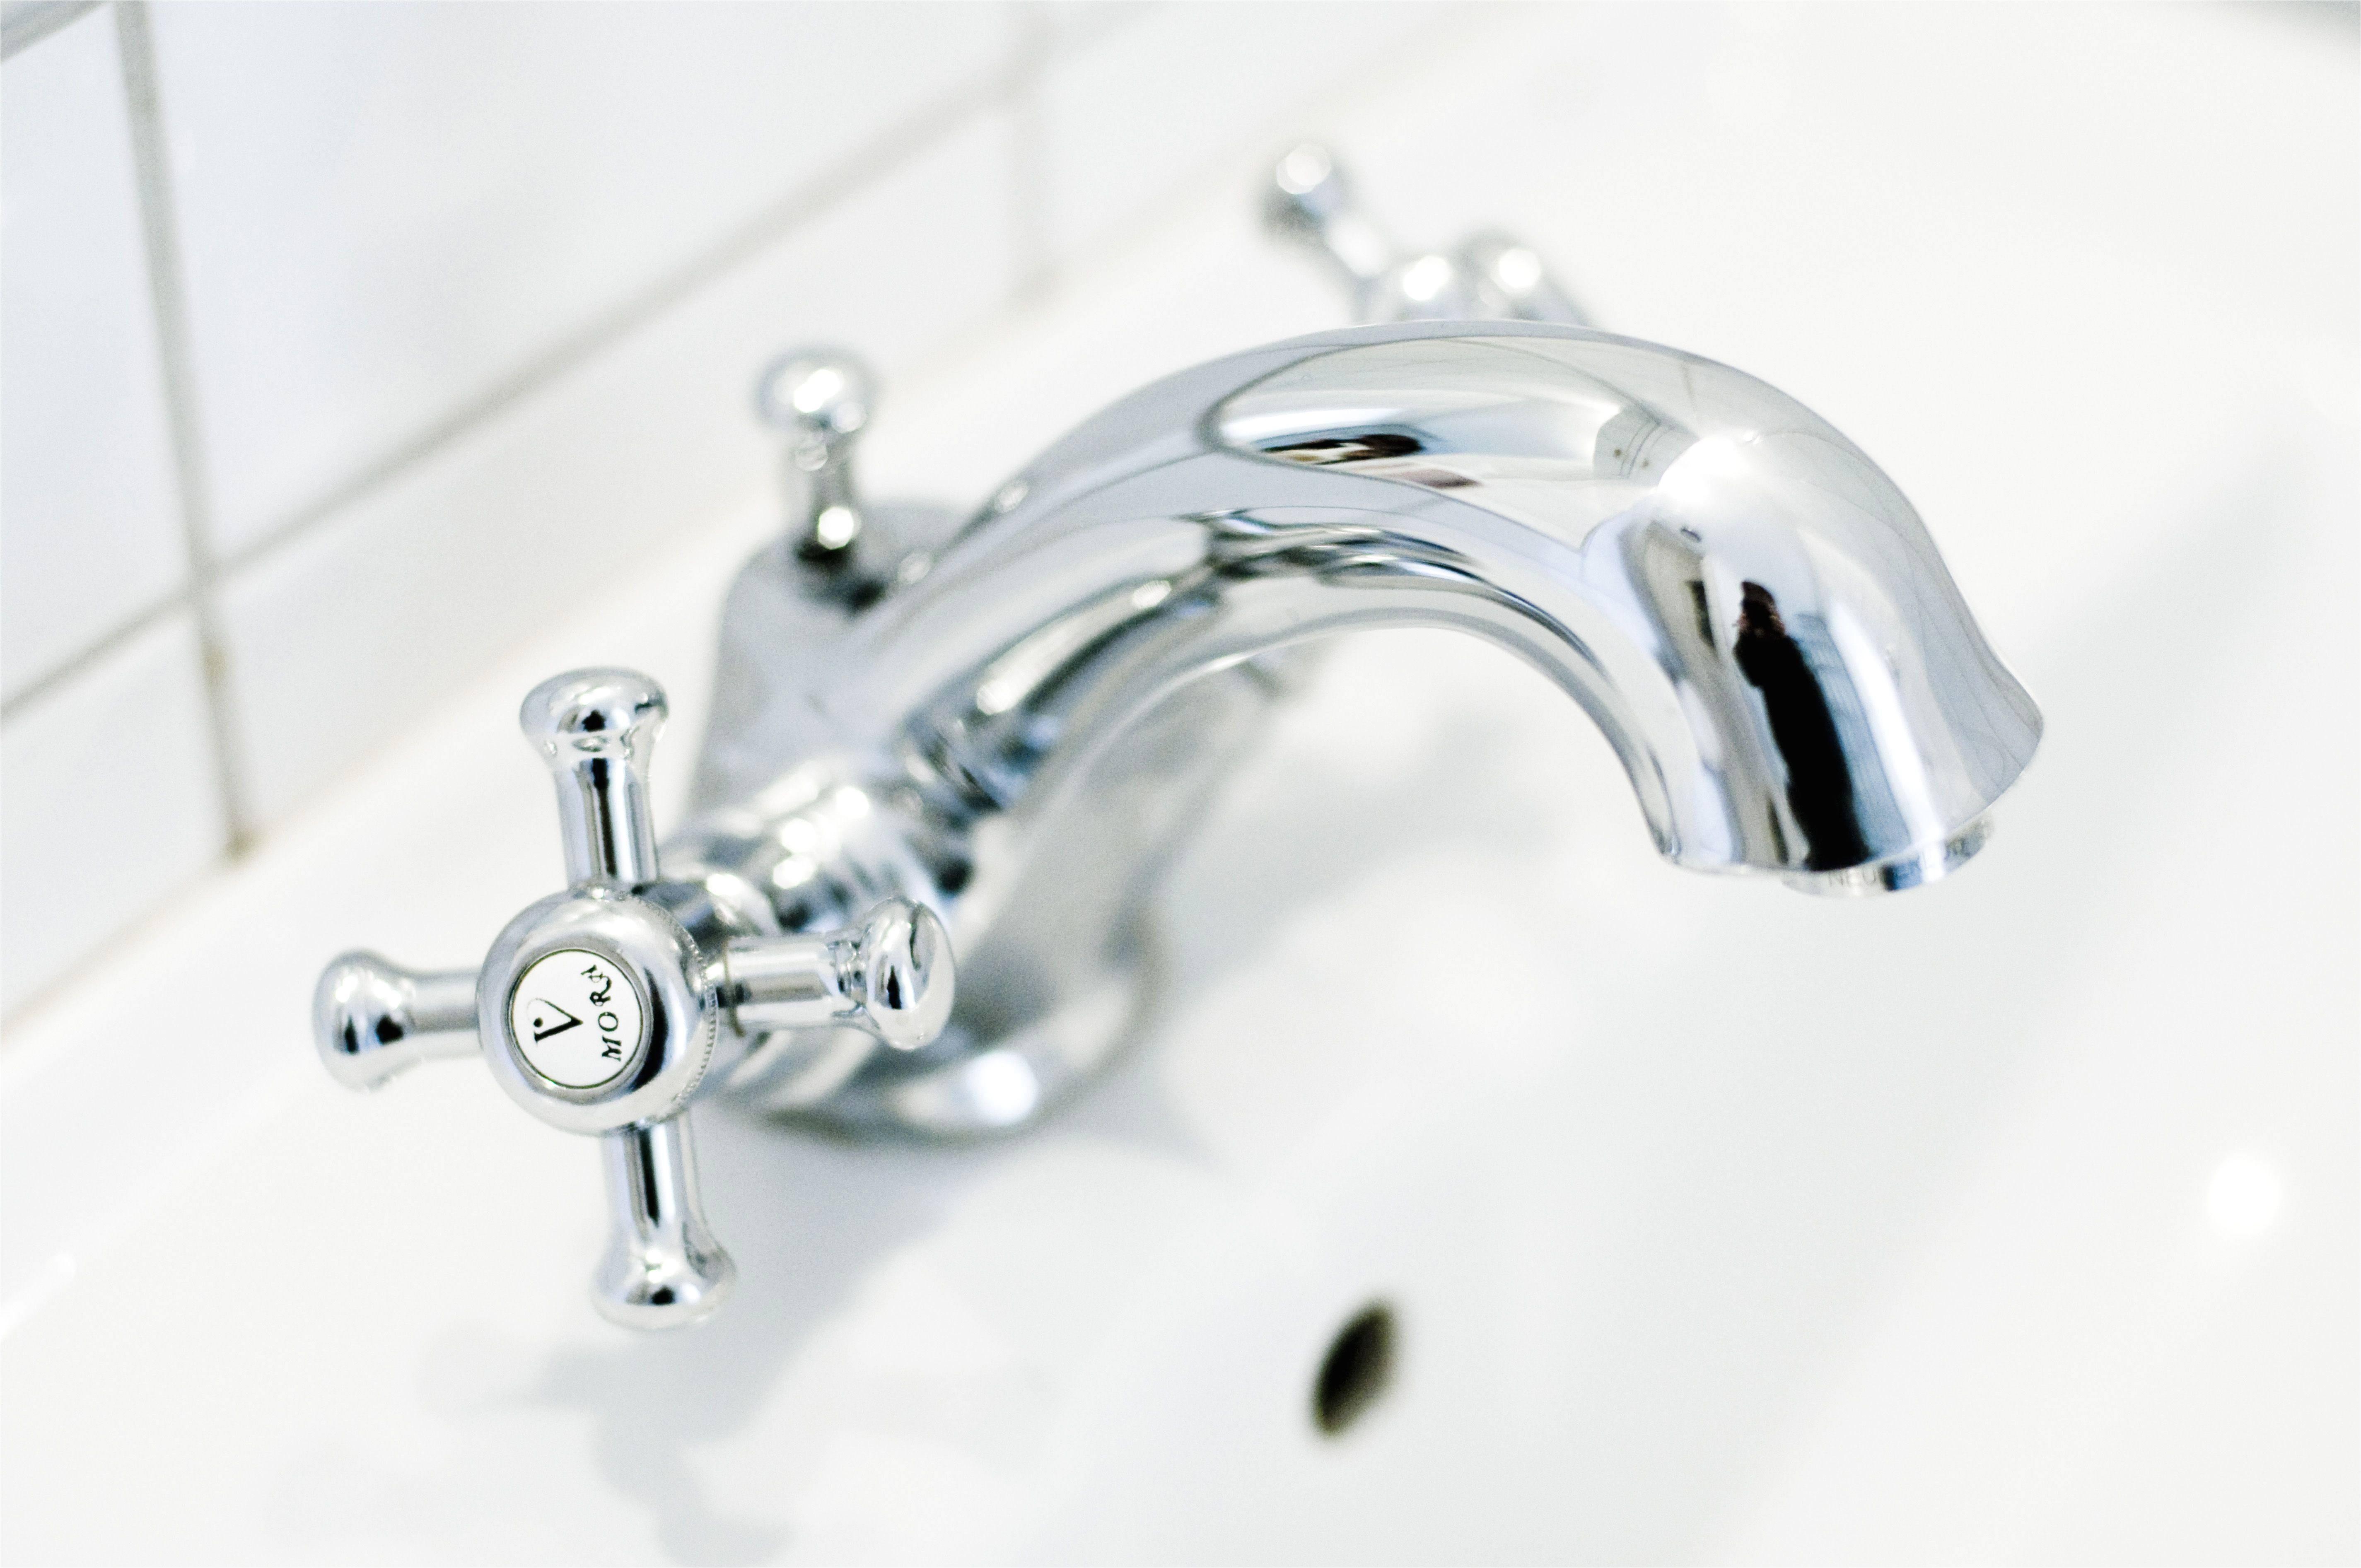 shower head valve beautiful shower head valve new shower head and valve fresh uberhaus faucets 0d